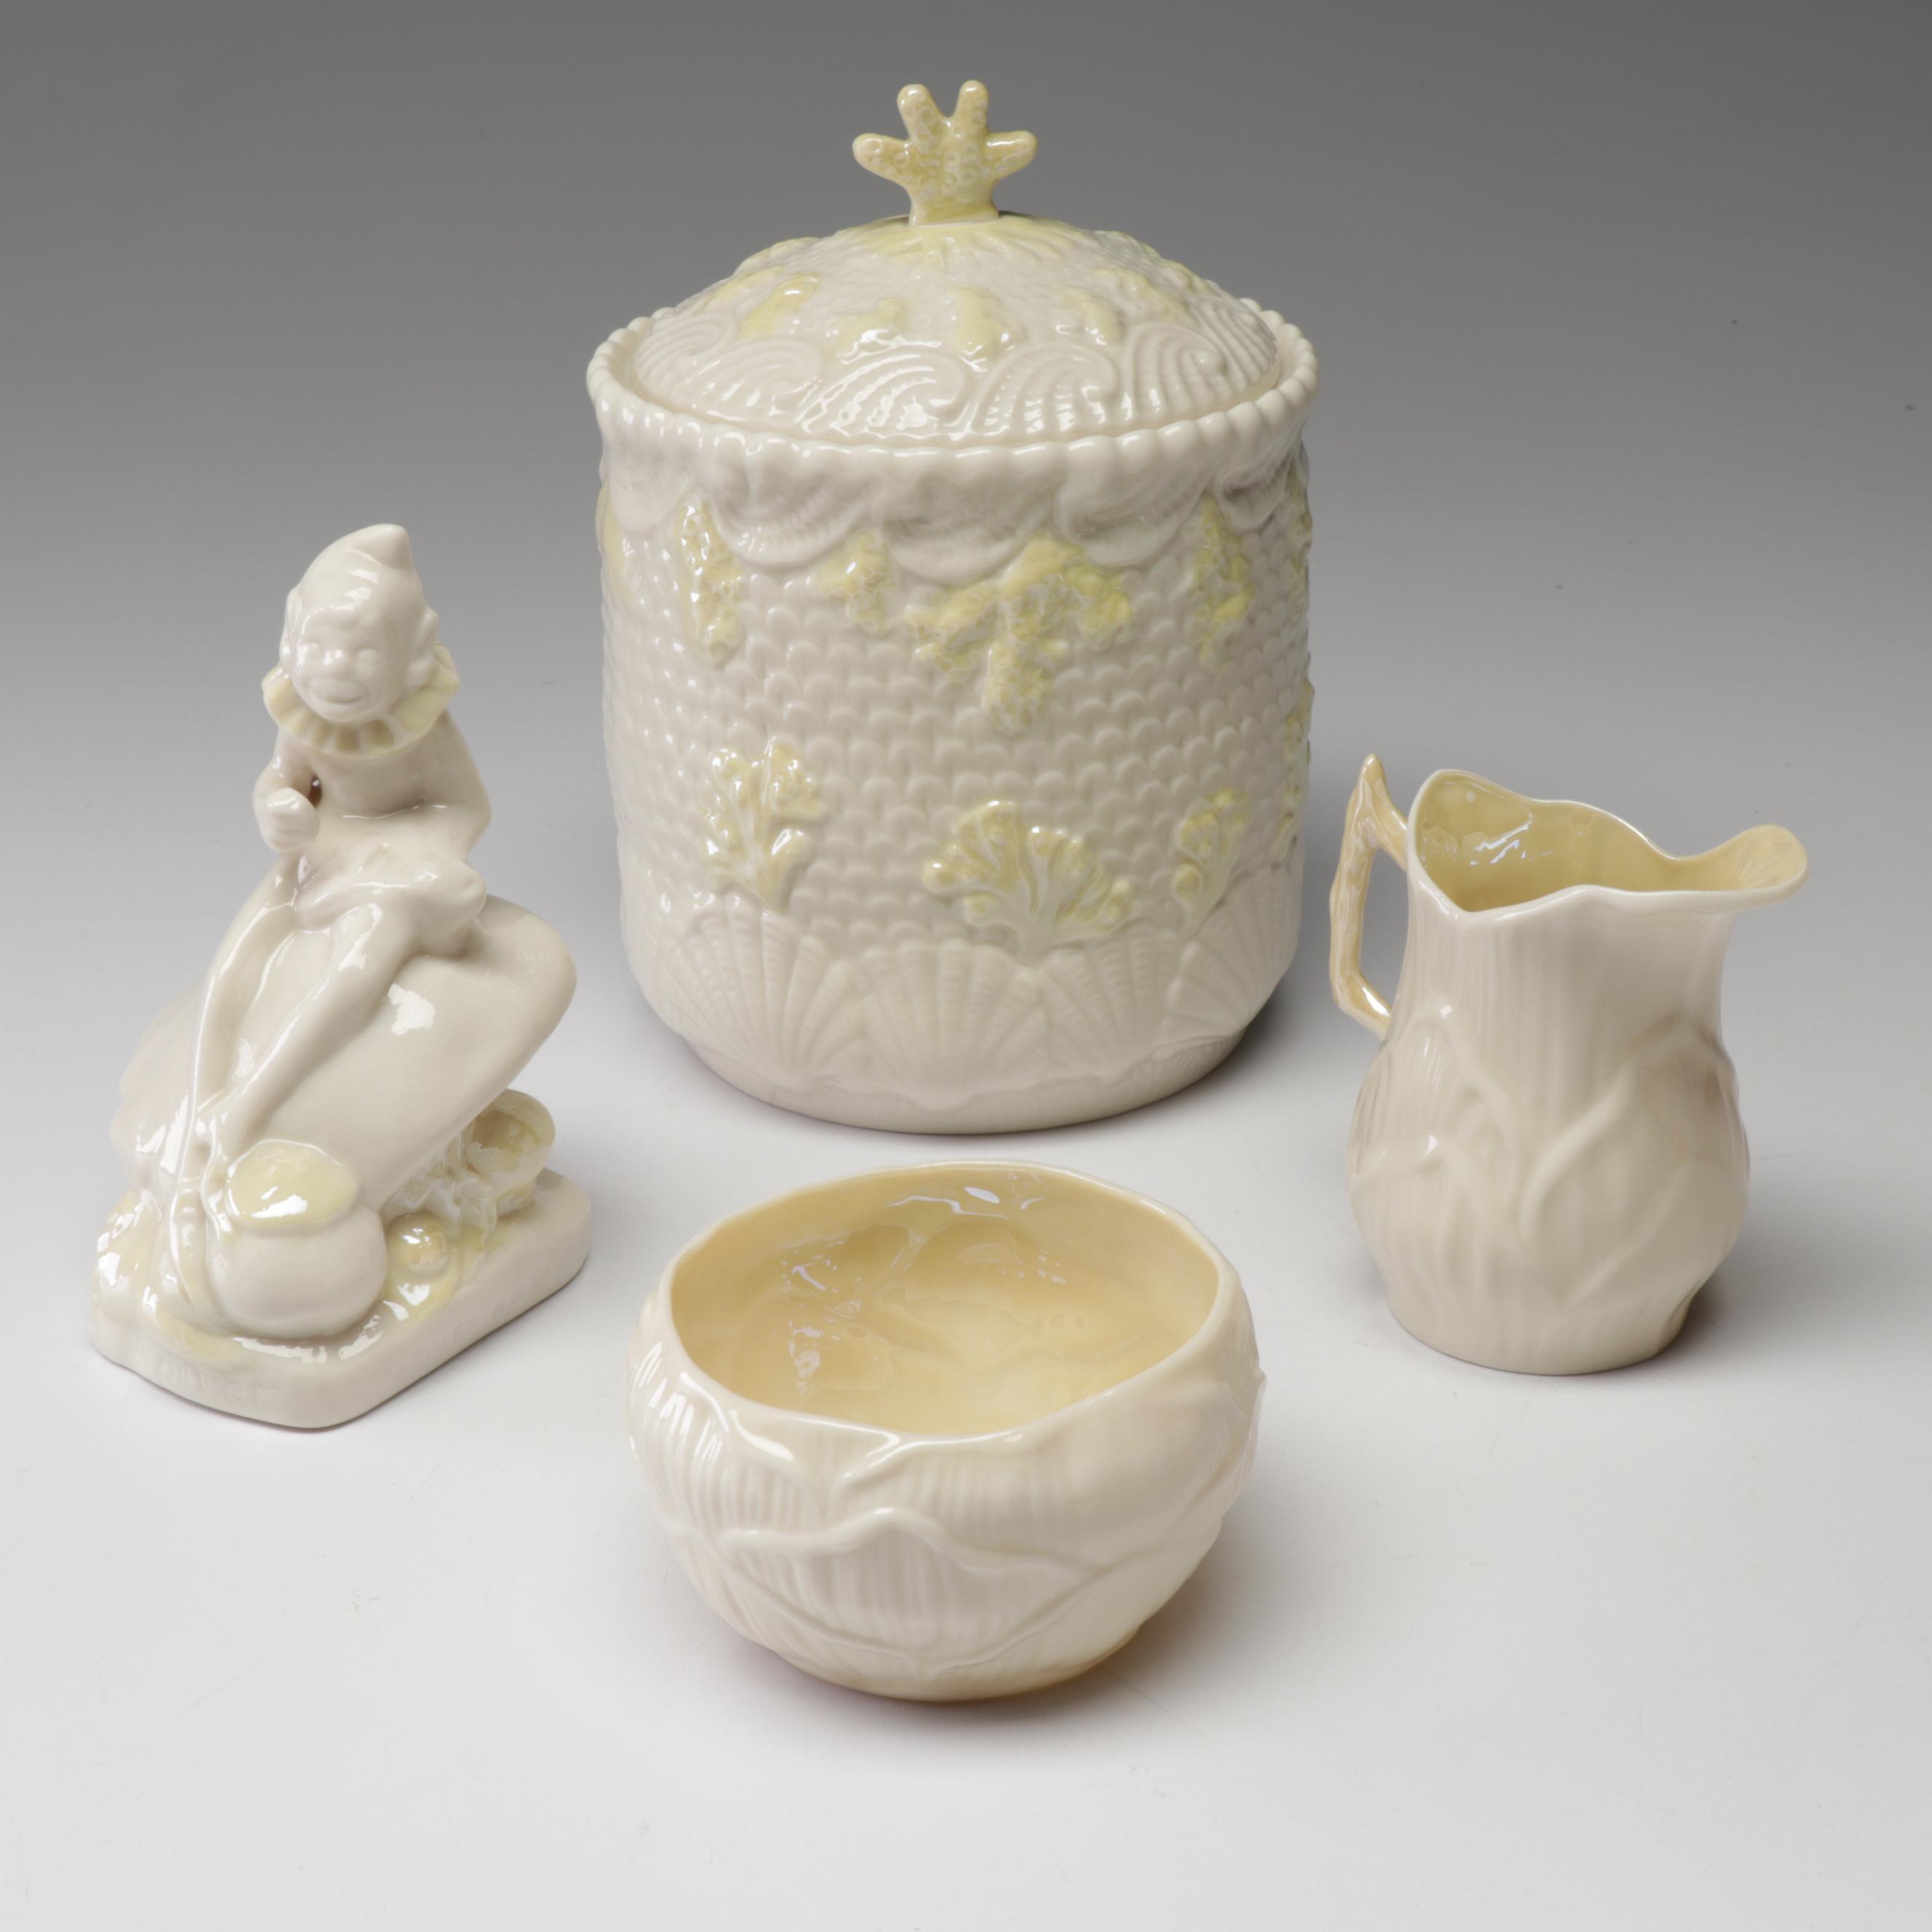 Belleek Tableware and Leprechaun Figurine